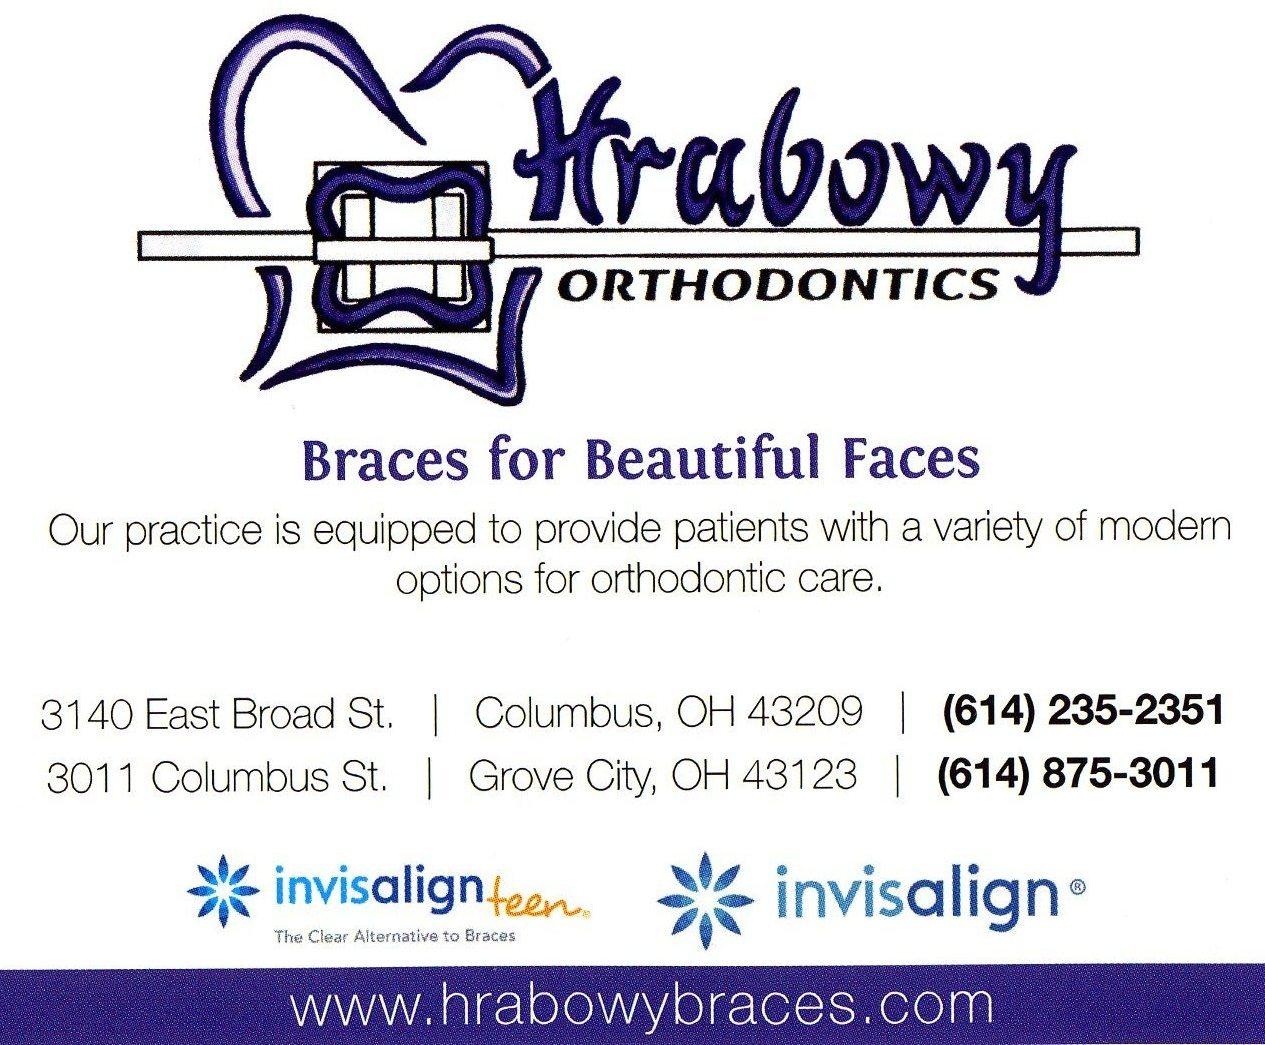 Dr. Erik Hrabowy Orthodontics